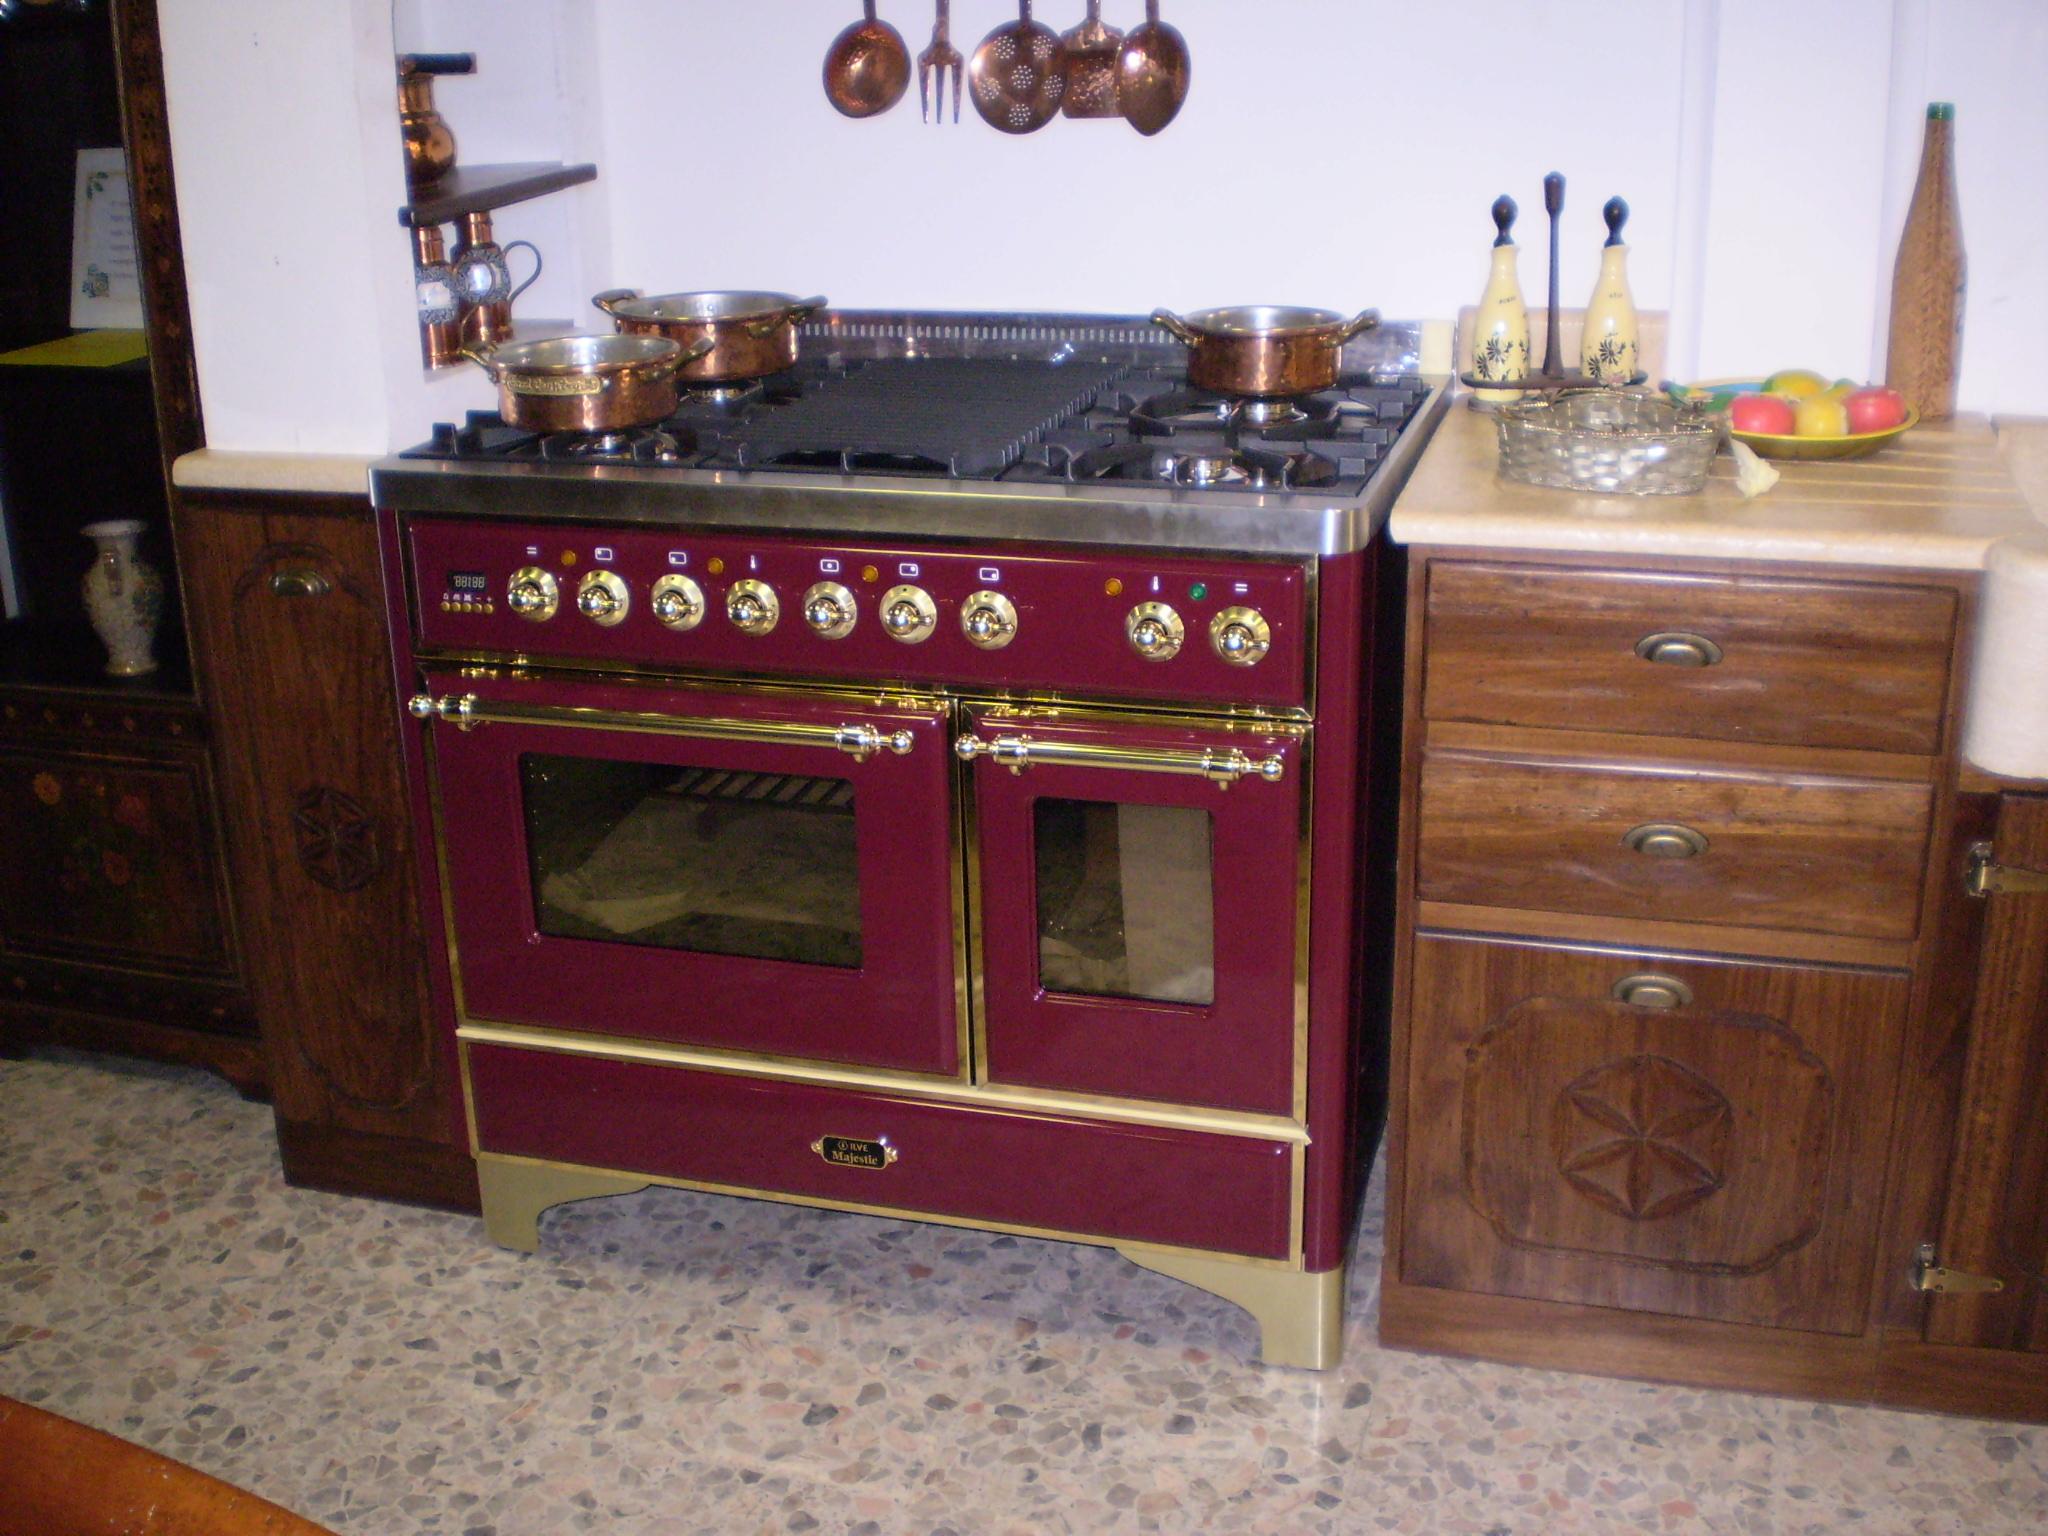 Cucine a gas usate: cucina usata offerte al volo. cucine a gas ...